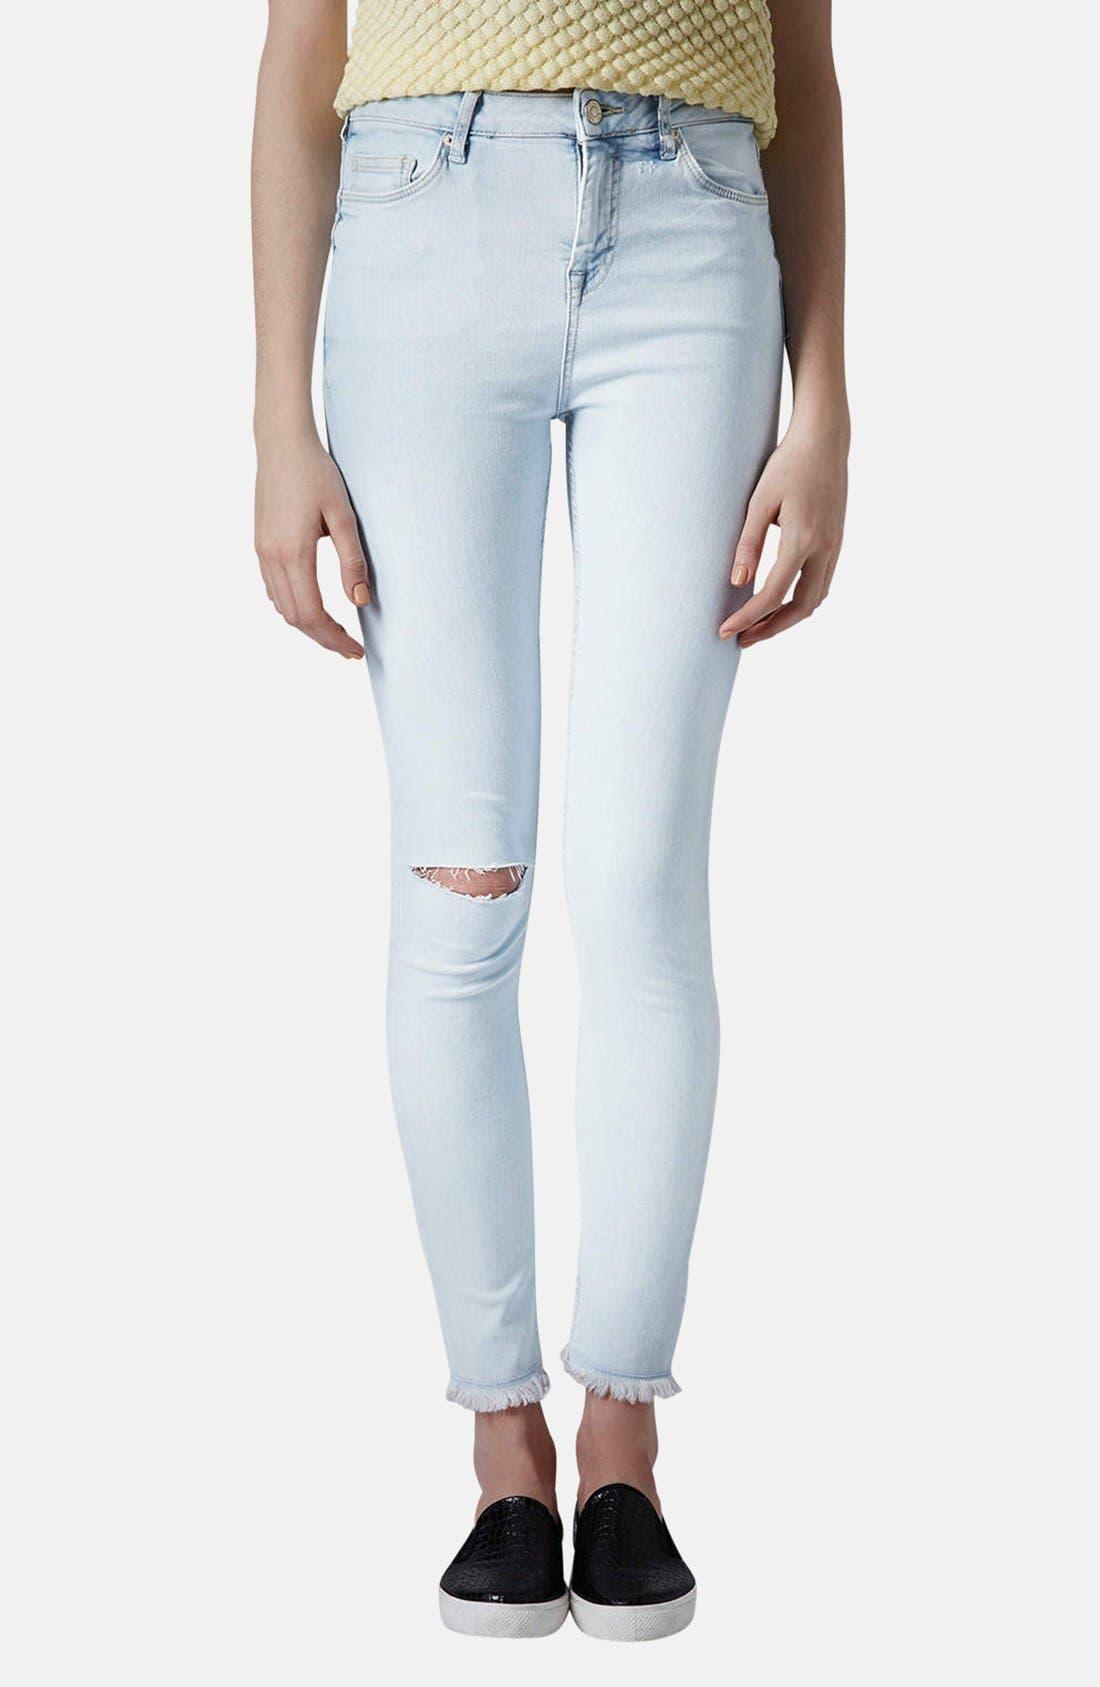 Alternate Image 1 Selected - Topshop Moto 'Jamie' High Rise Skinny Jeans (Light Blue) (Regular & Short)